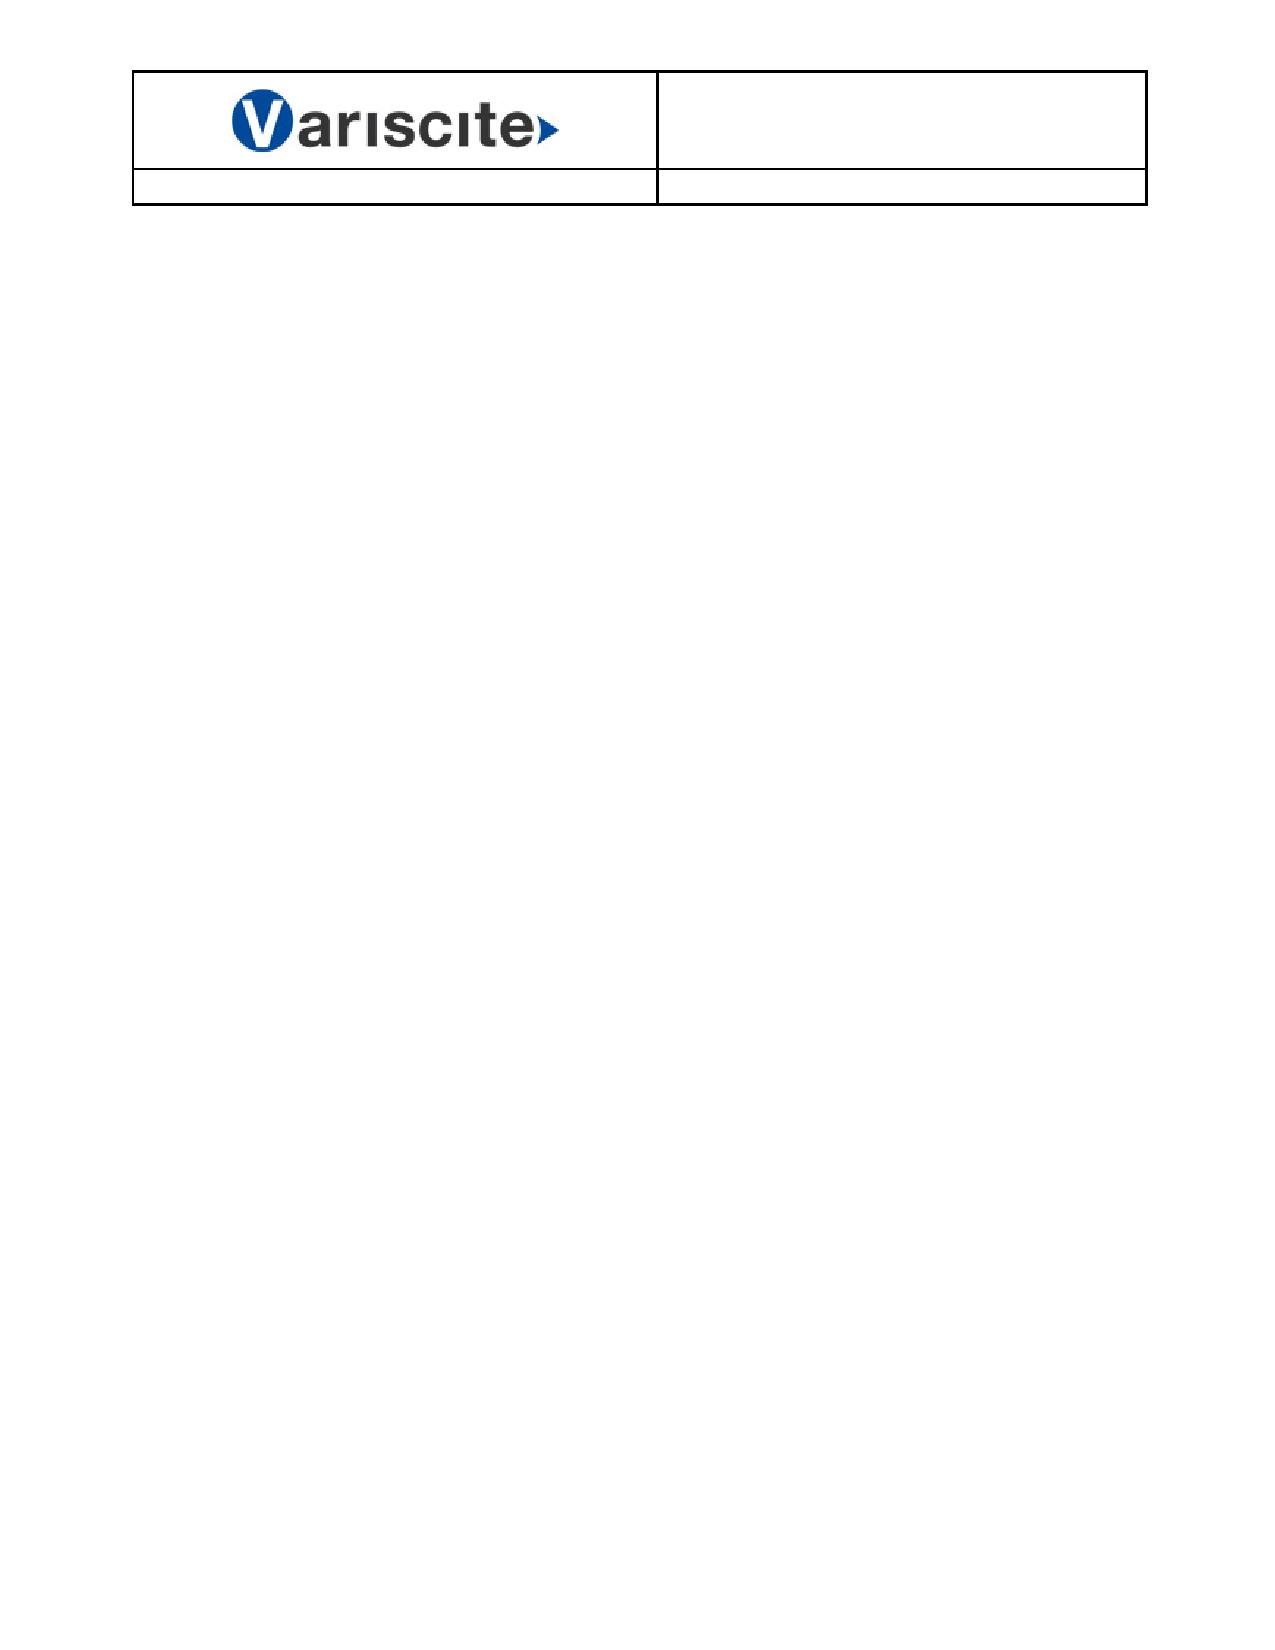 DART-SD800 pdf, 반도체, 판매, 대치품